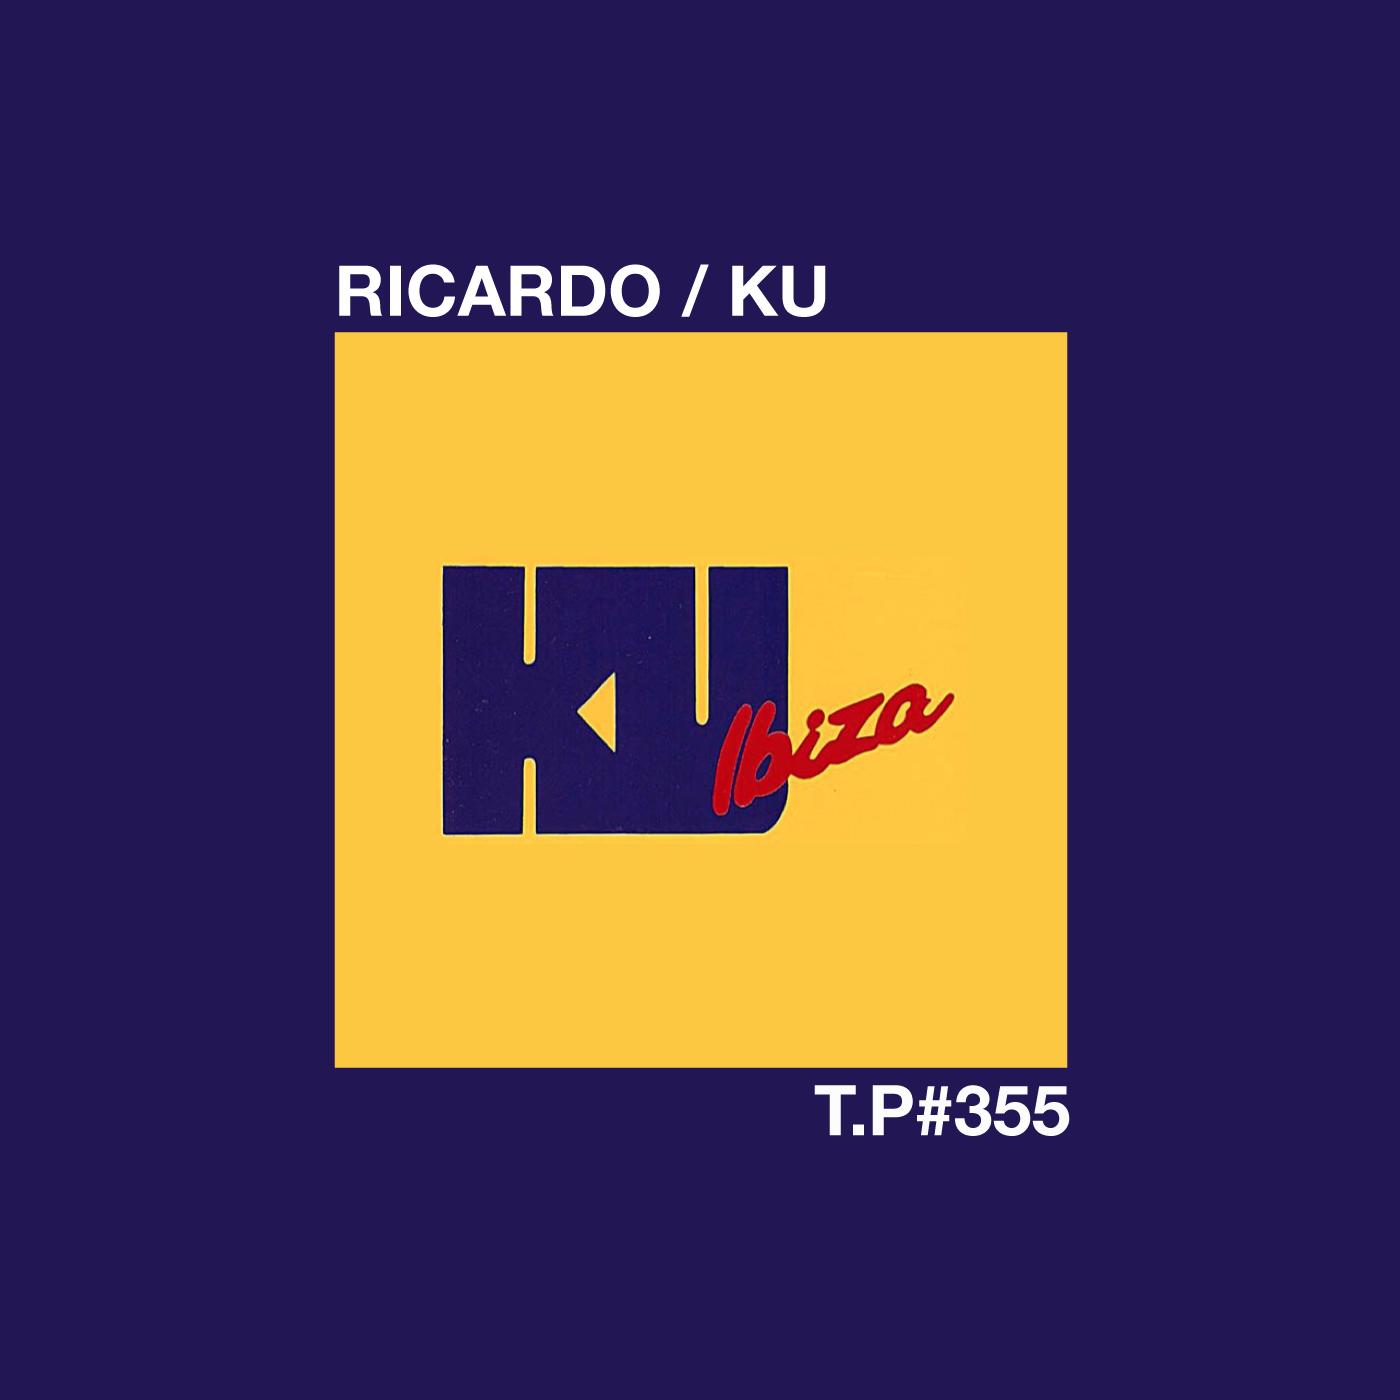 DJ, Ricardo, Ku, Ibiza, Test Pressing, History, Stop Bajon, Hey Survivor, Club, Live